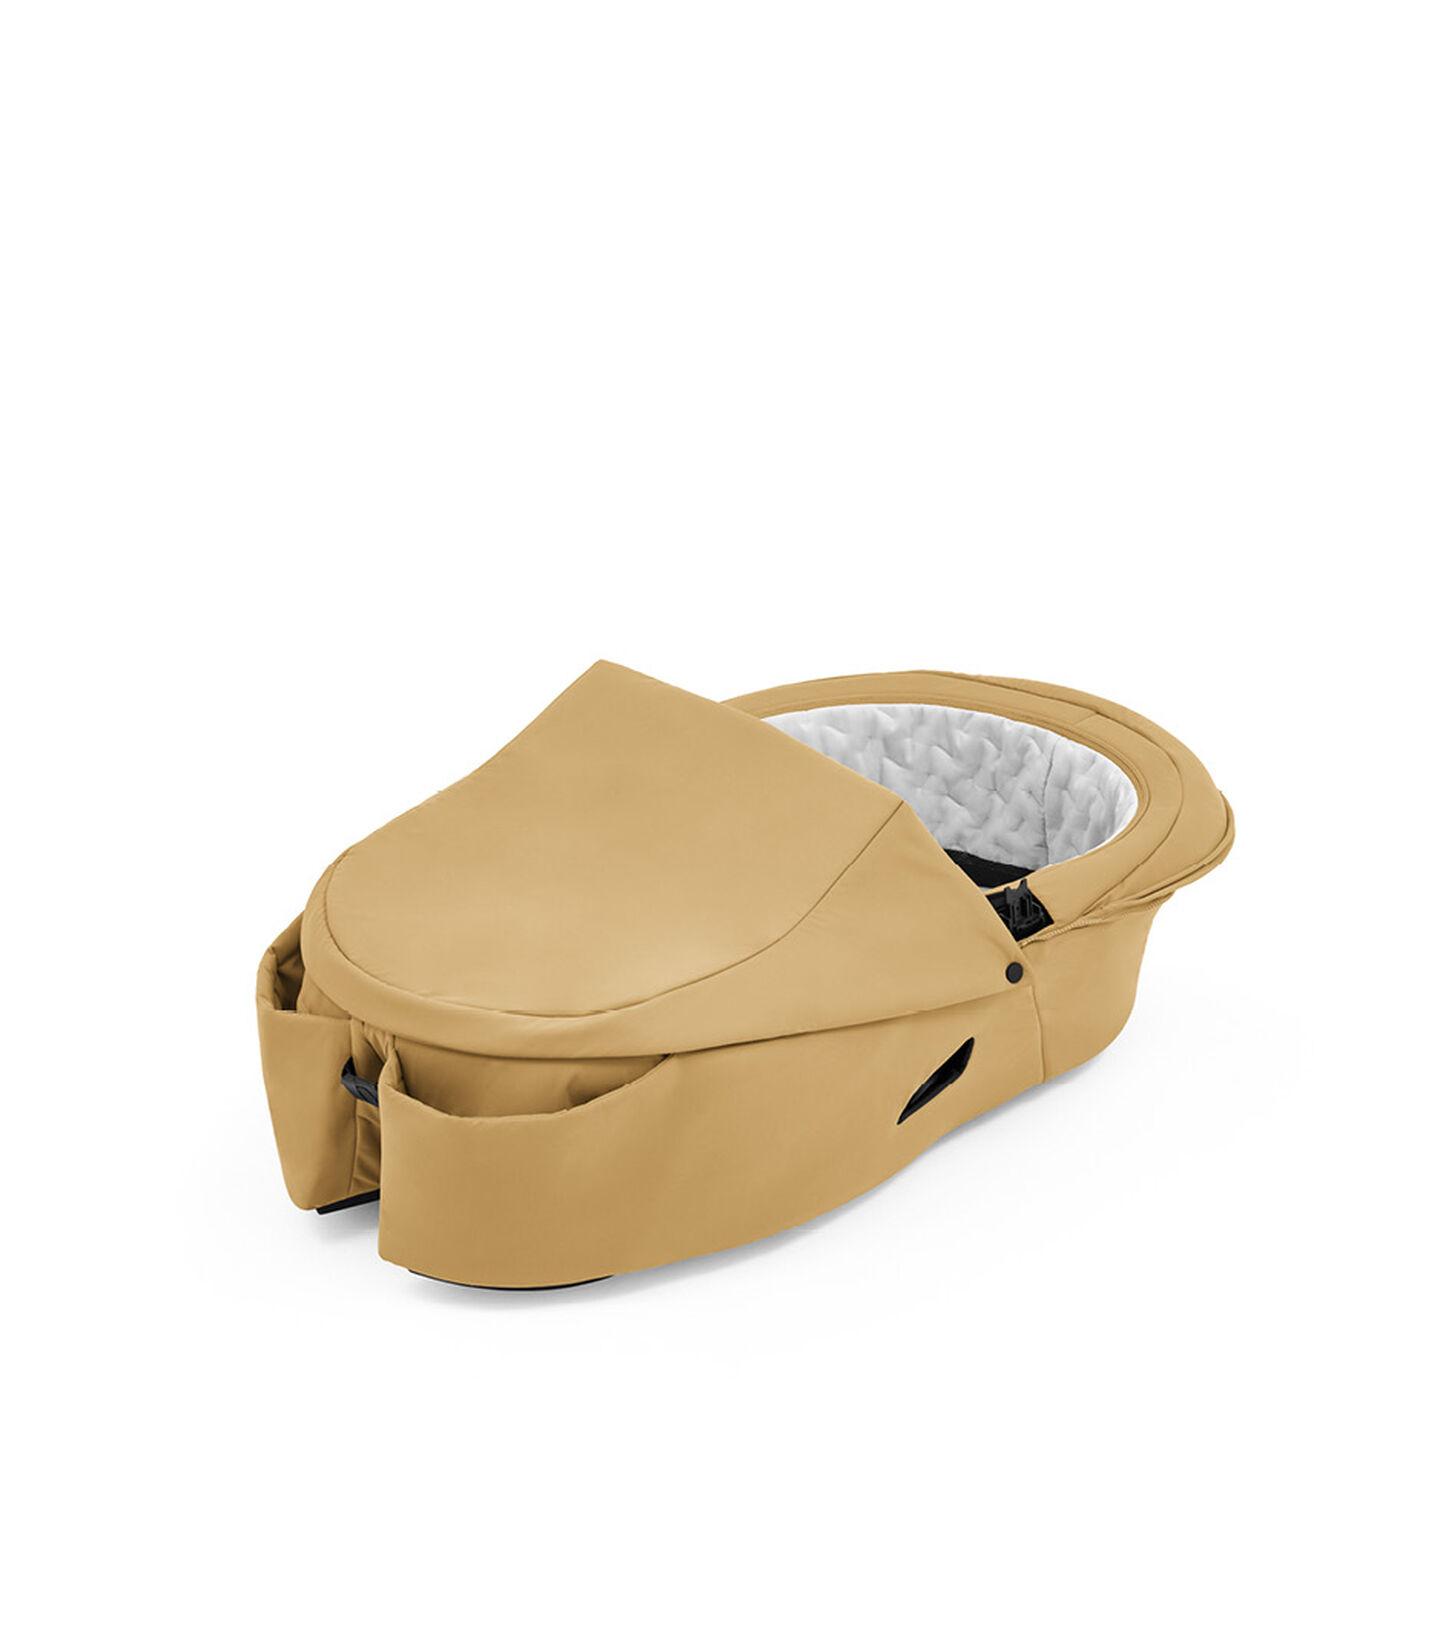 Stokke® Xplory® X Carry Cot Golden Yellow, Giallo Dorato, mainview view 2